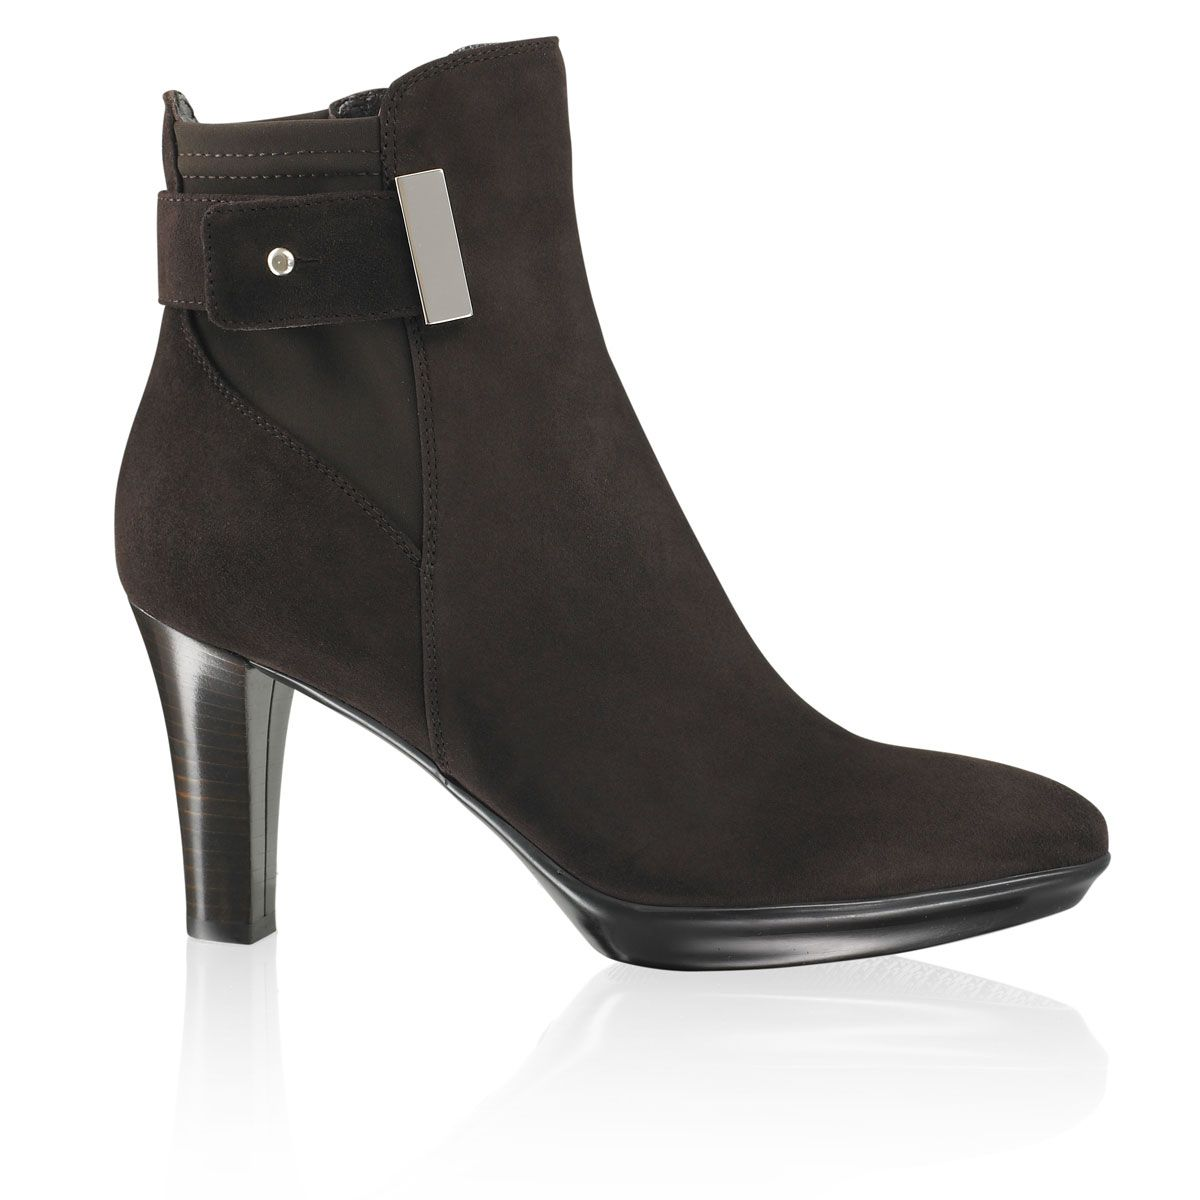 Womens Heels New 13174362 Aquatalia By Marvin K Una Black Wedge